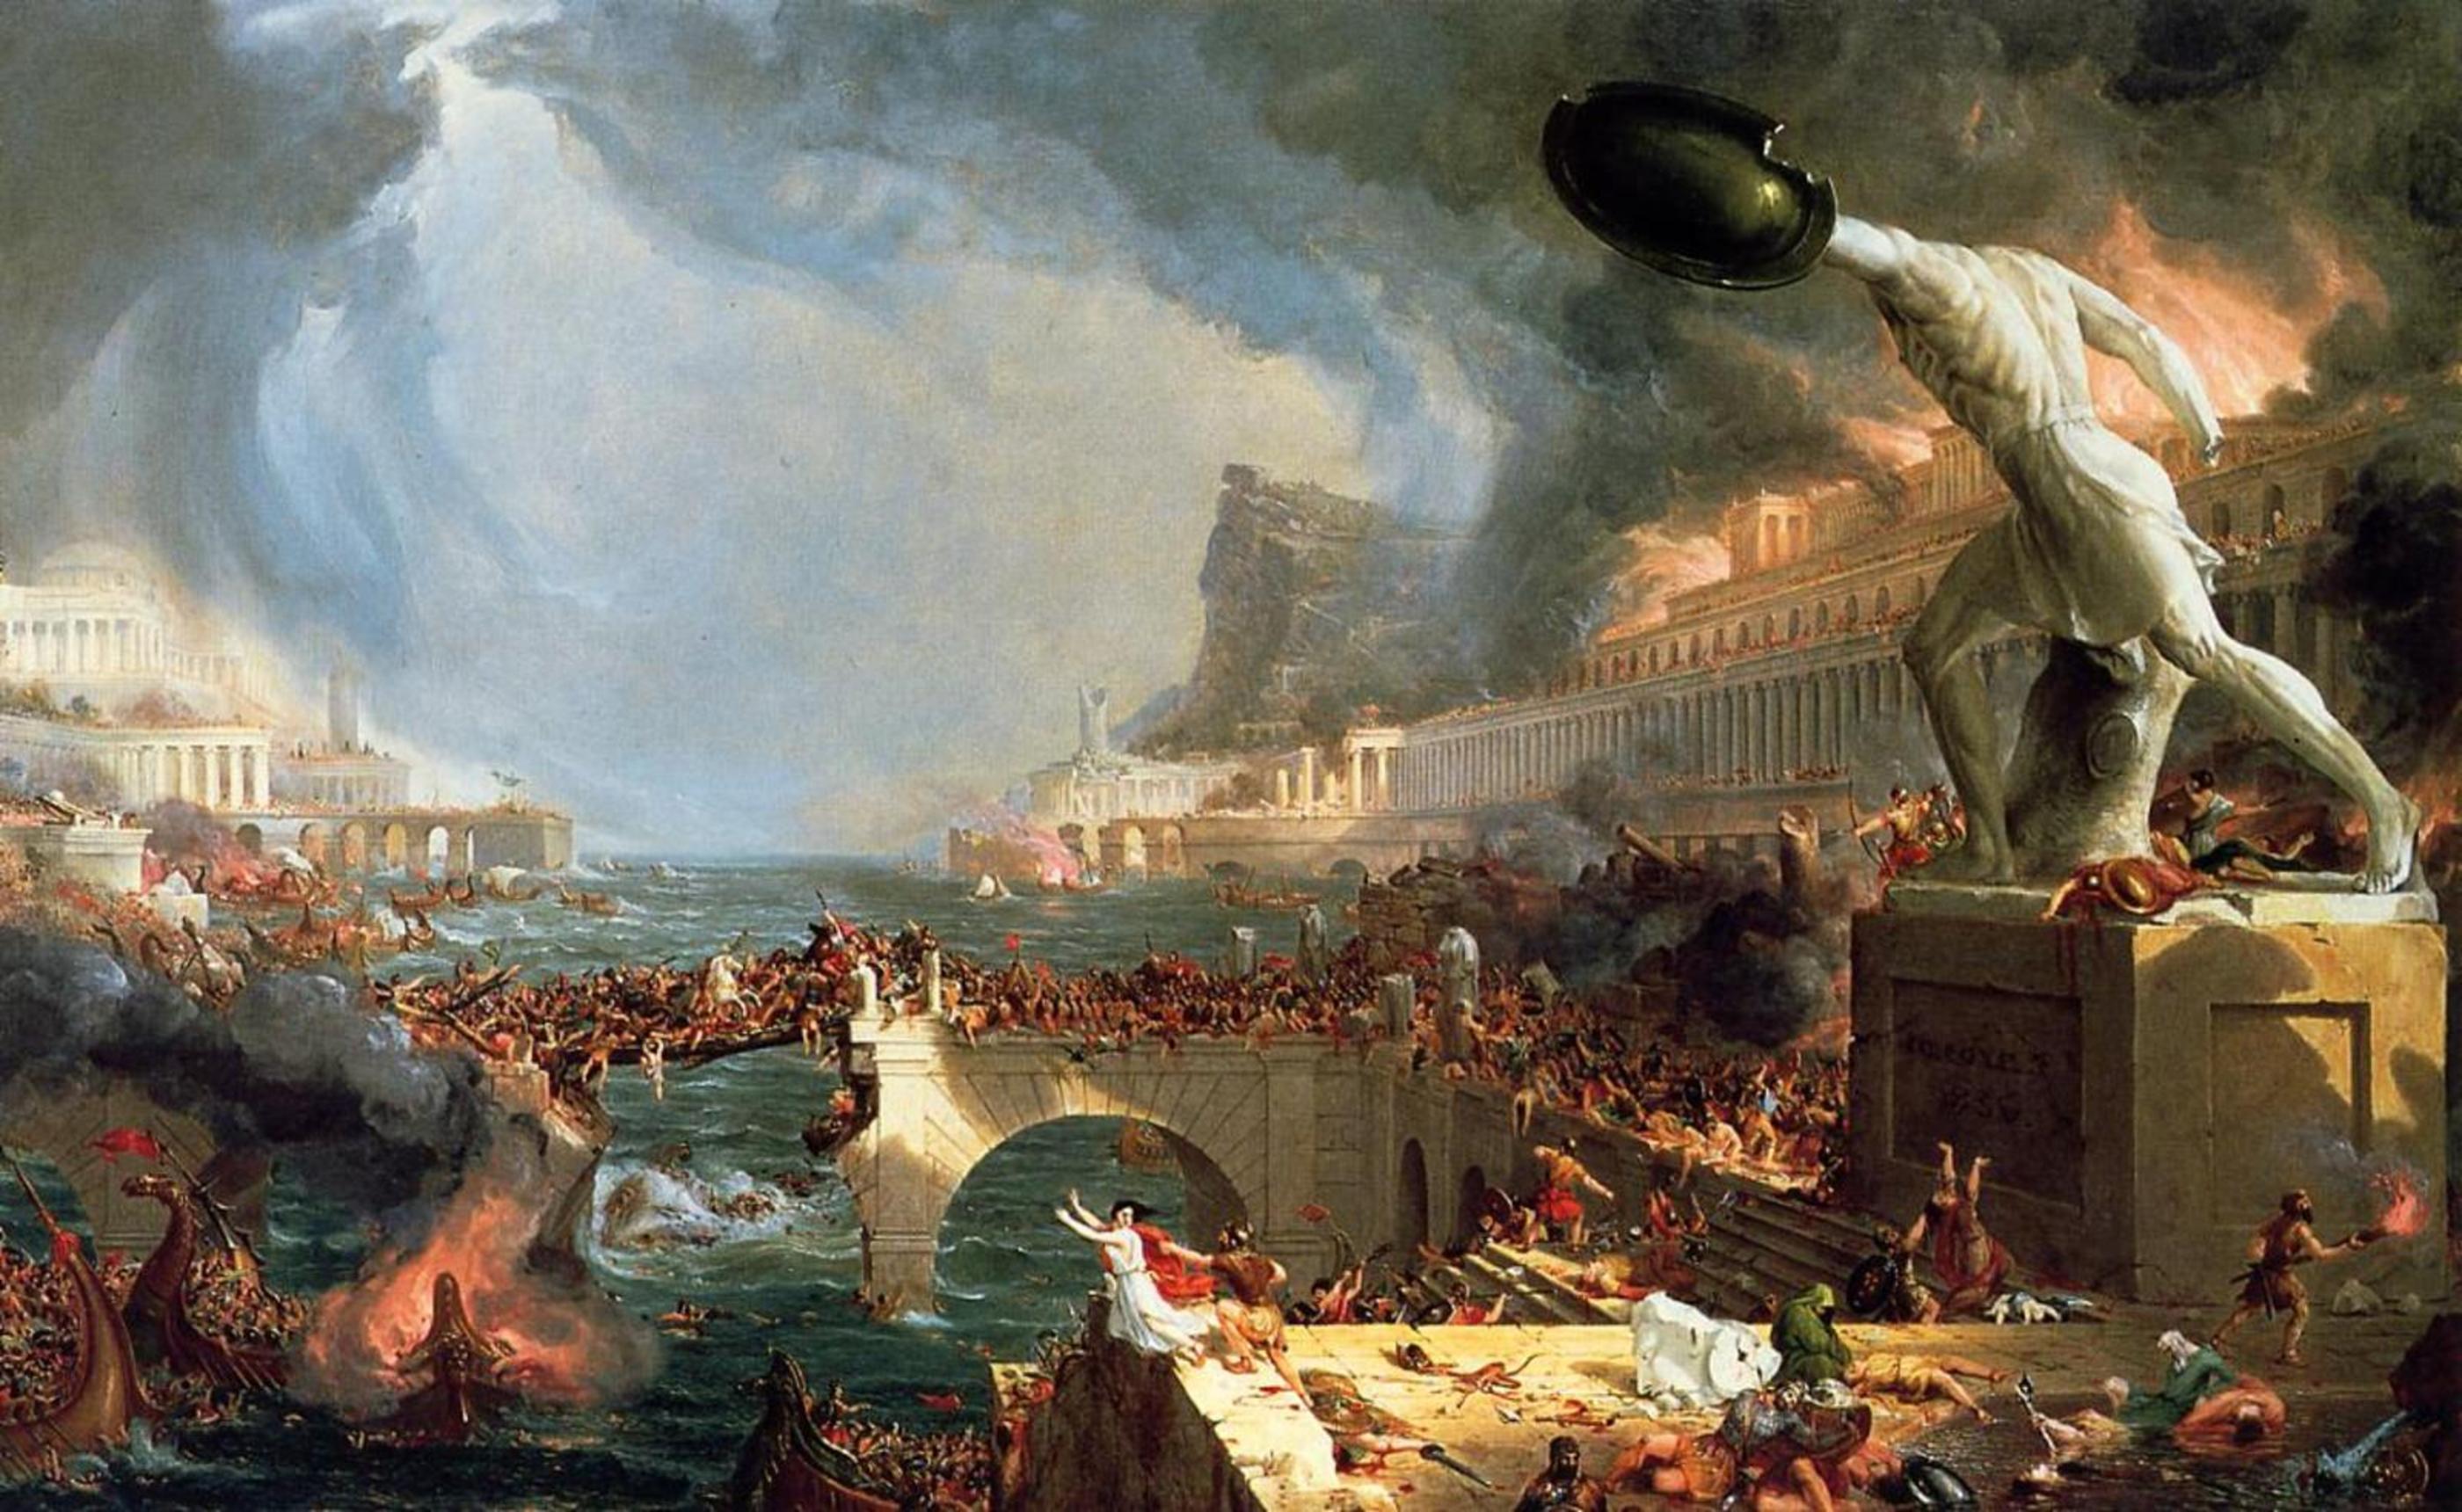 картина Падение Римской империи :: Томас Коул - Архитектура фото